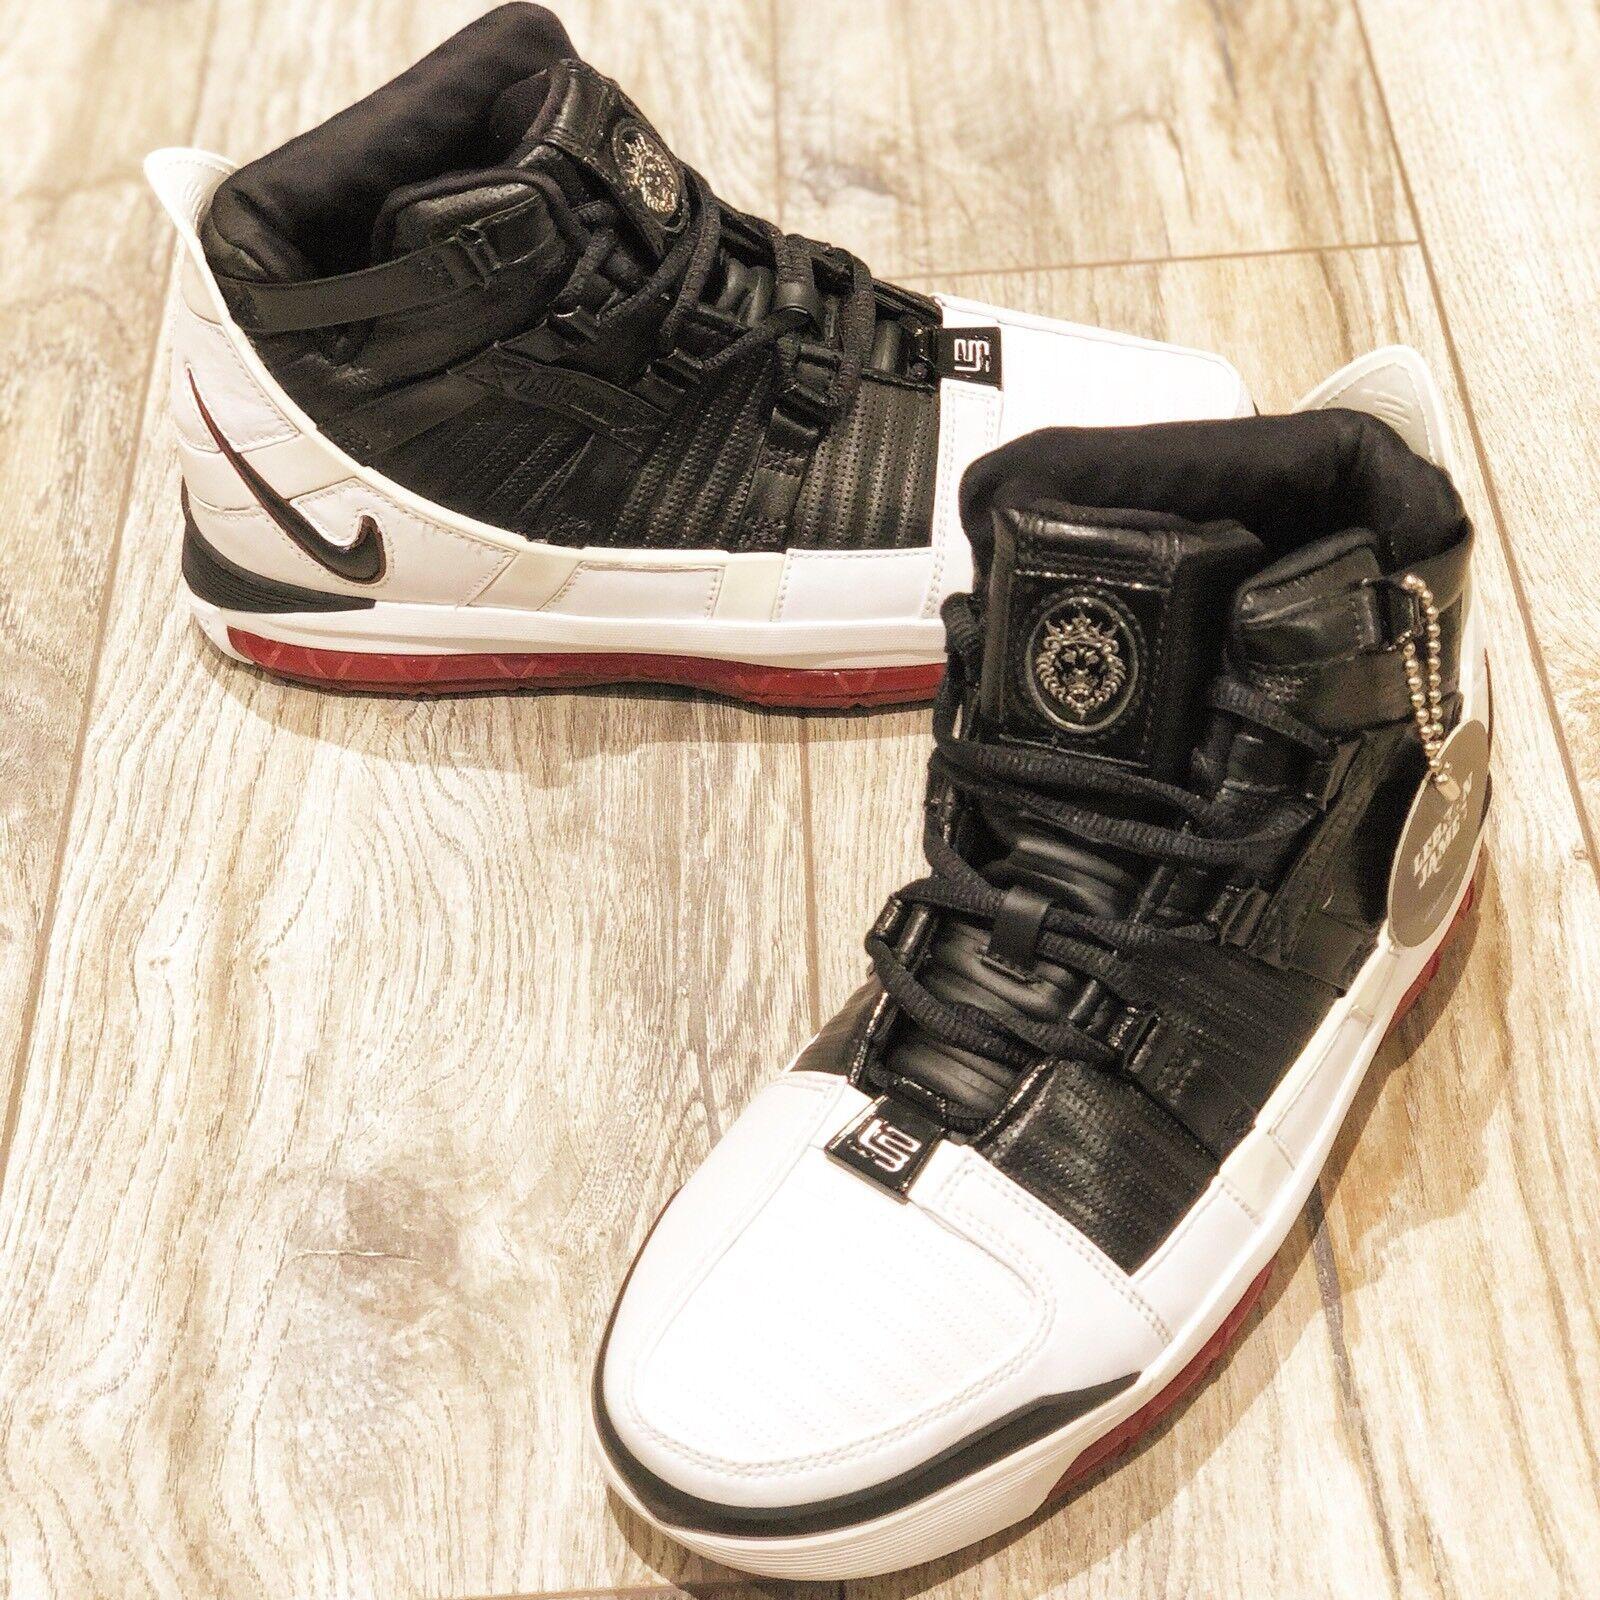 Nike Zoom Lebron III Crimson 3 Black White Varsity Crimson III ac1df9